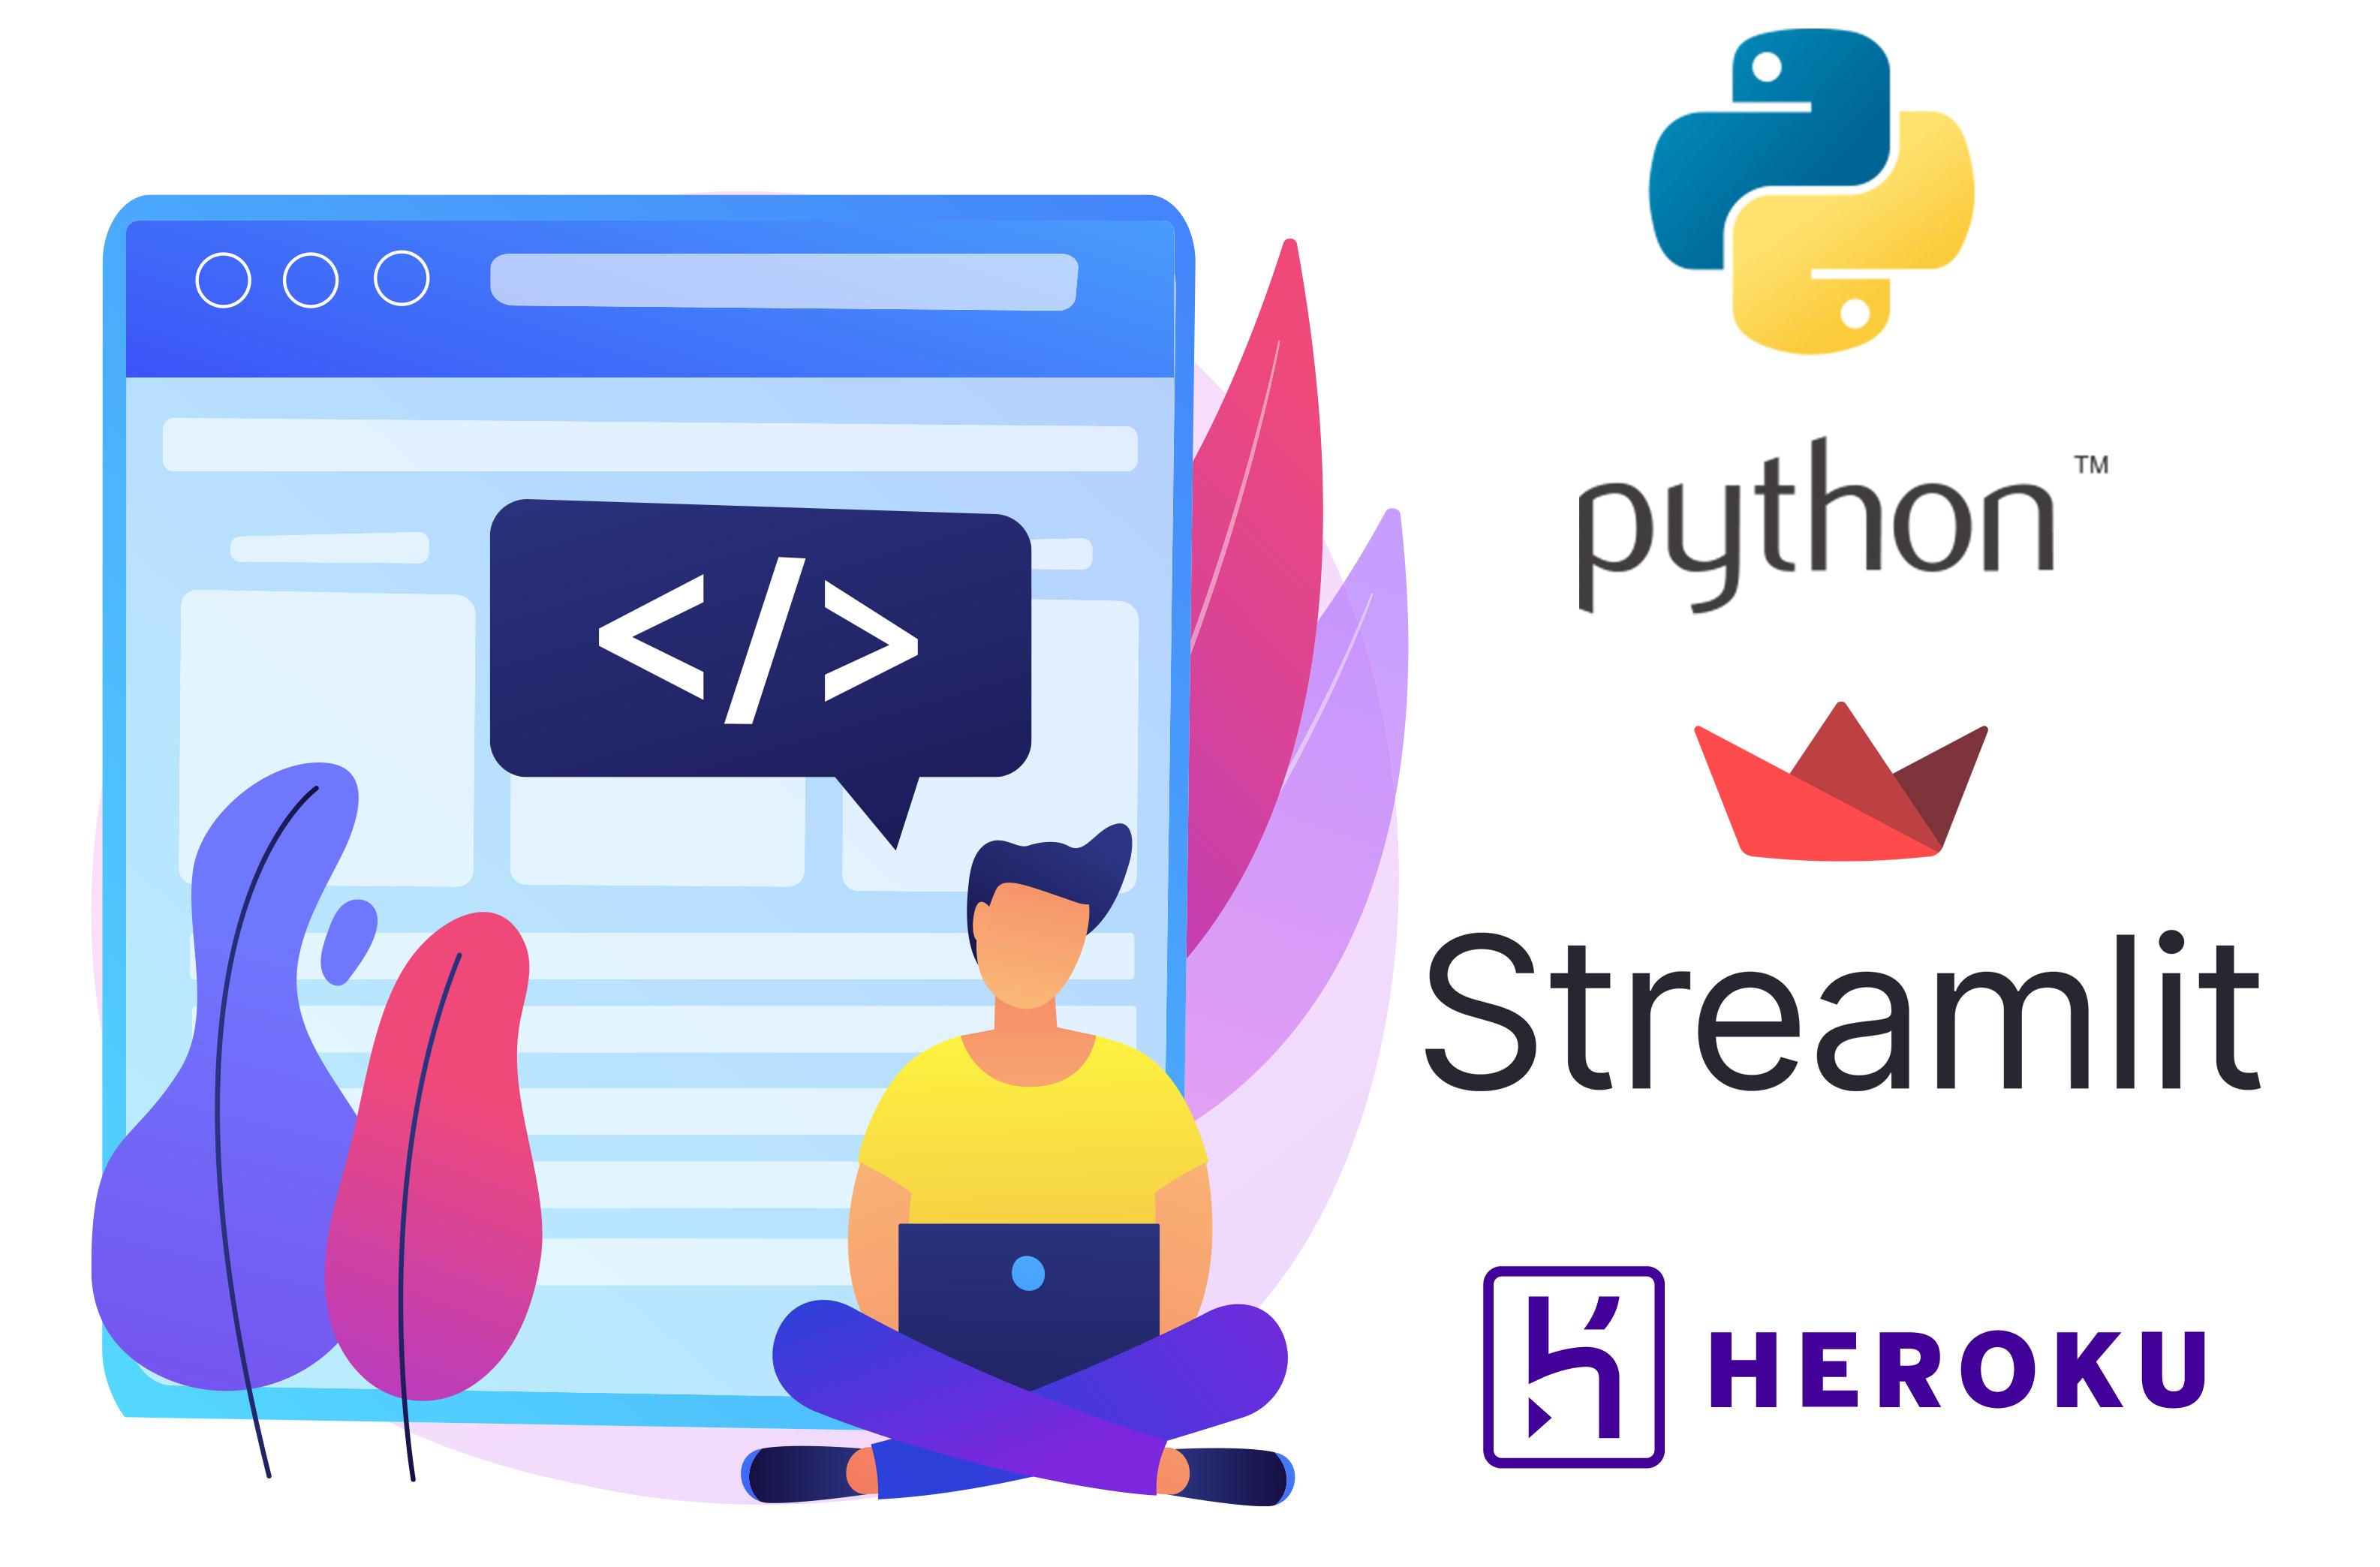 webapp with Streamlit and Heroku